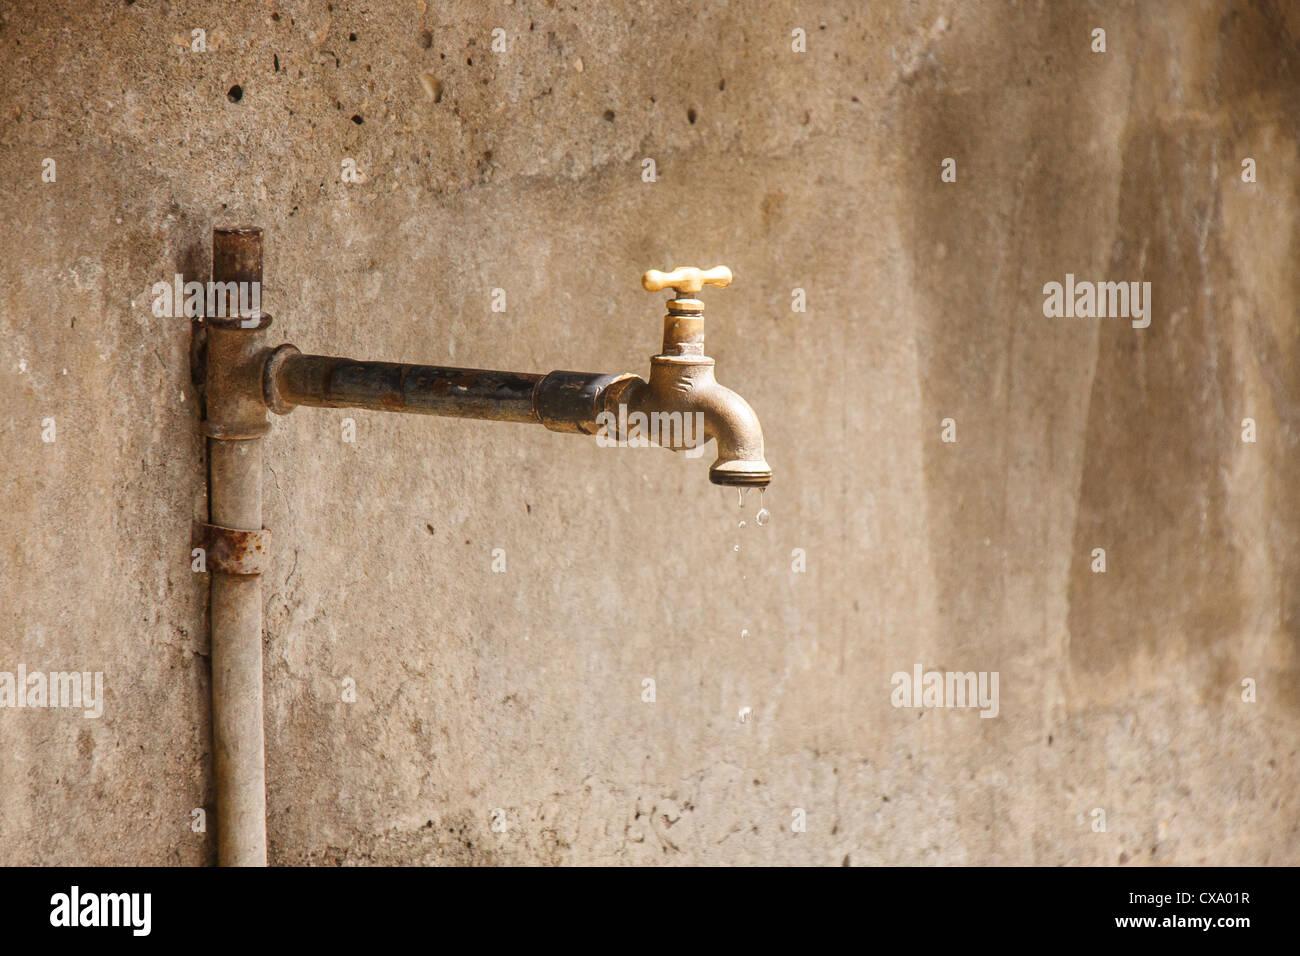 Water Spigot Stock Photos & Water Spigot Stock Images - Alamy